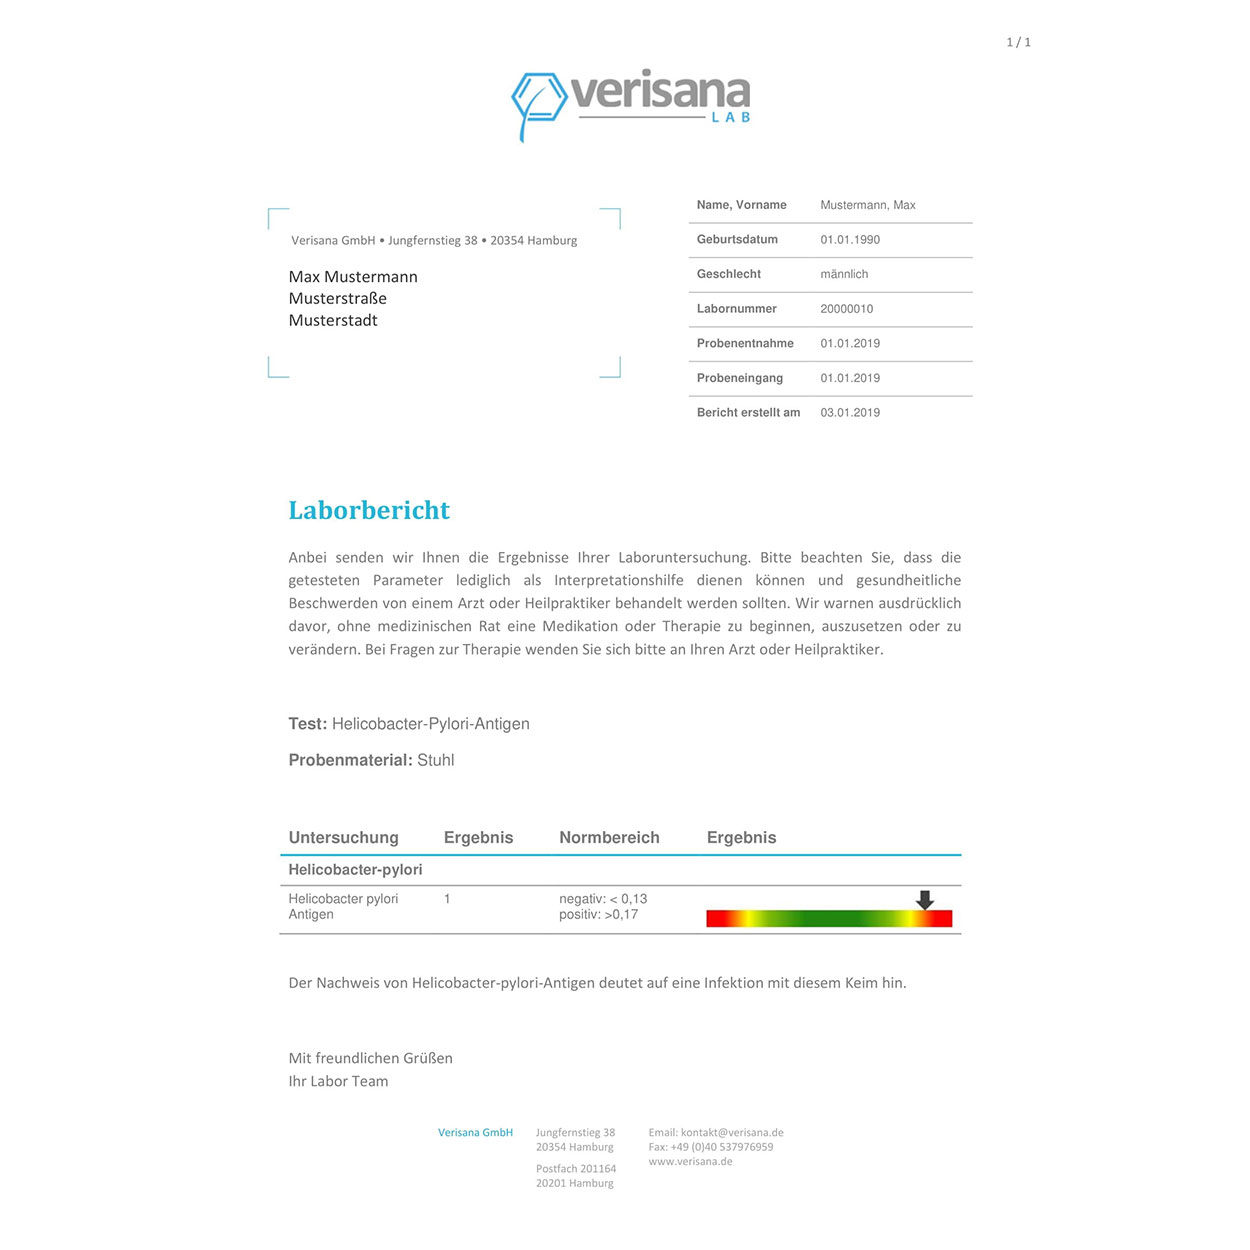 Helicobacter-pylori-Antigentest, Labormusterbefund